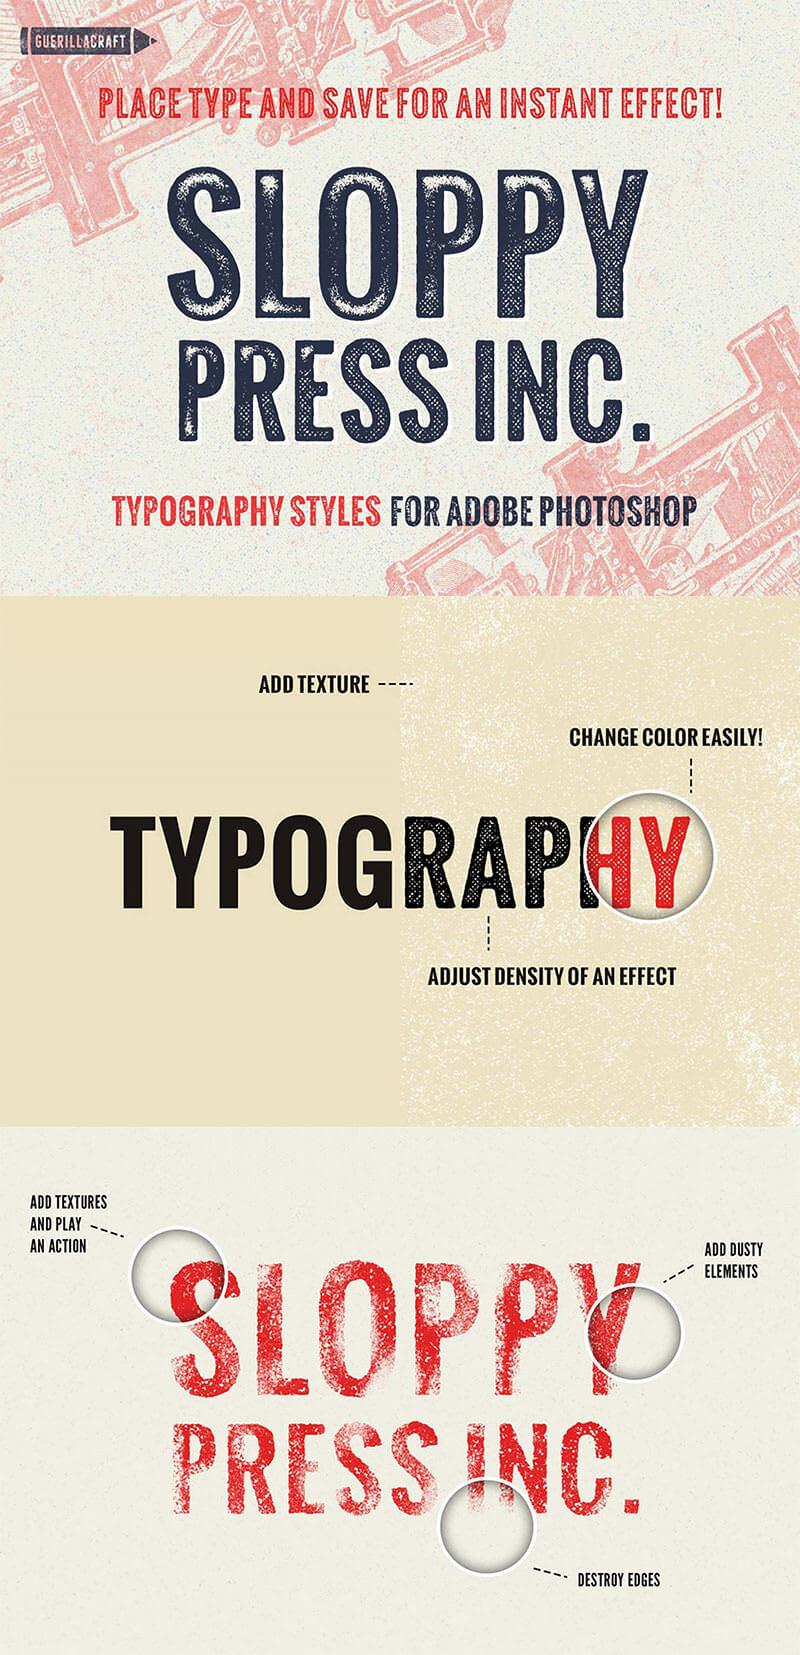 photoshop-layer-styles-6-1600x1191